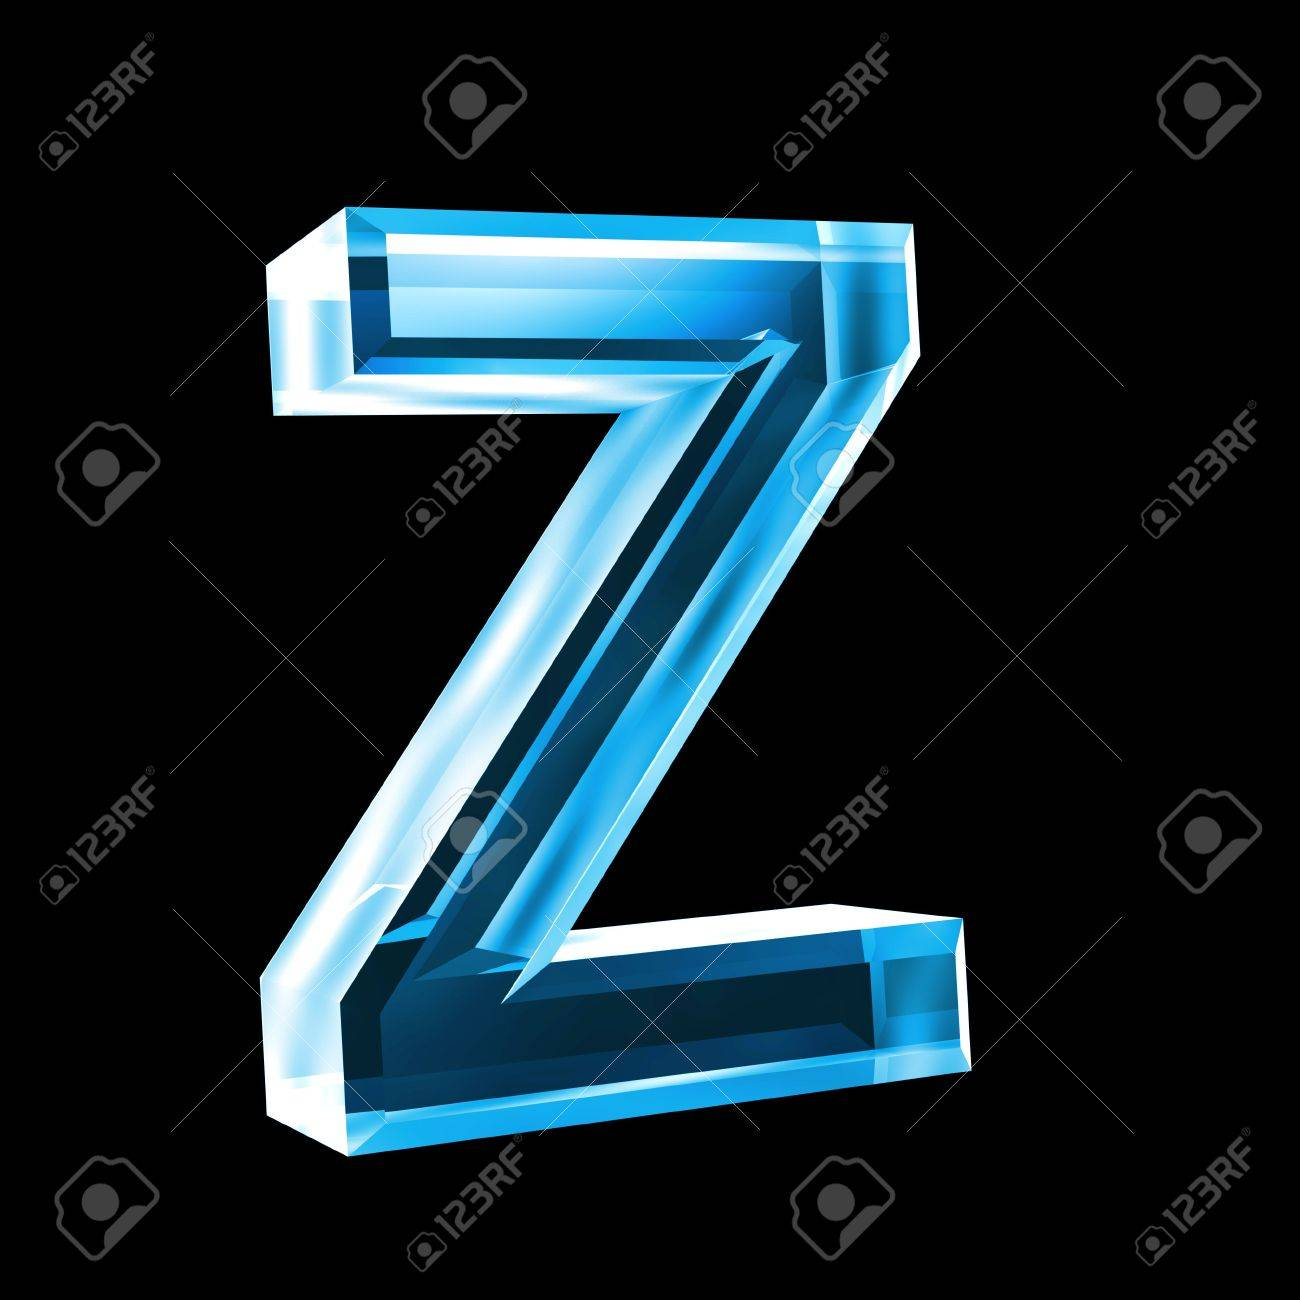 letter z in blue glass 3D Stock Photo - 6456018